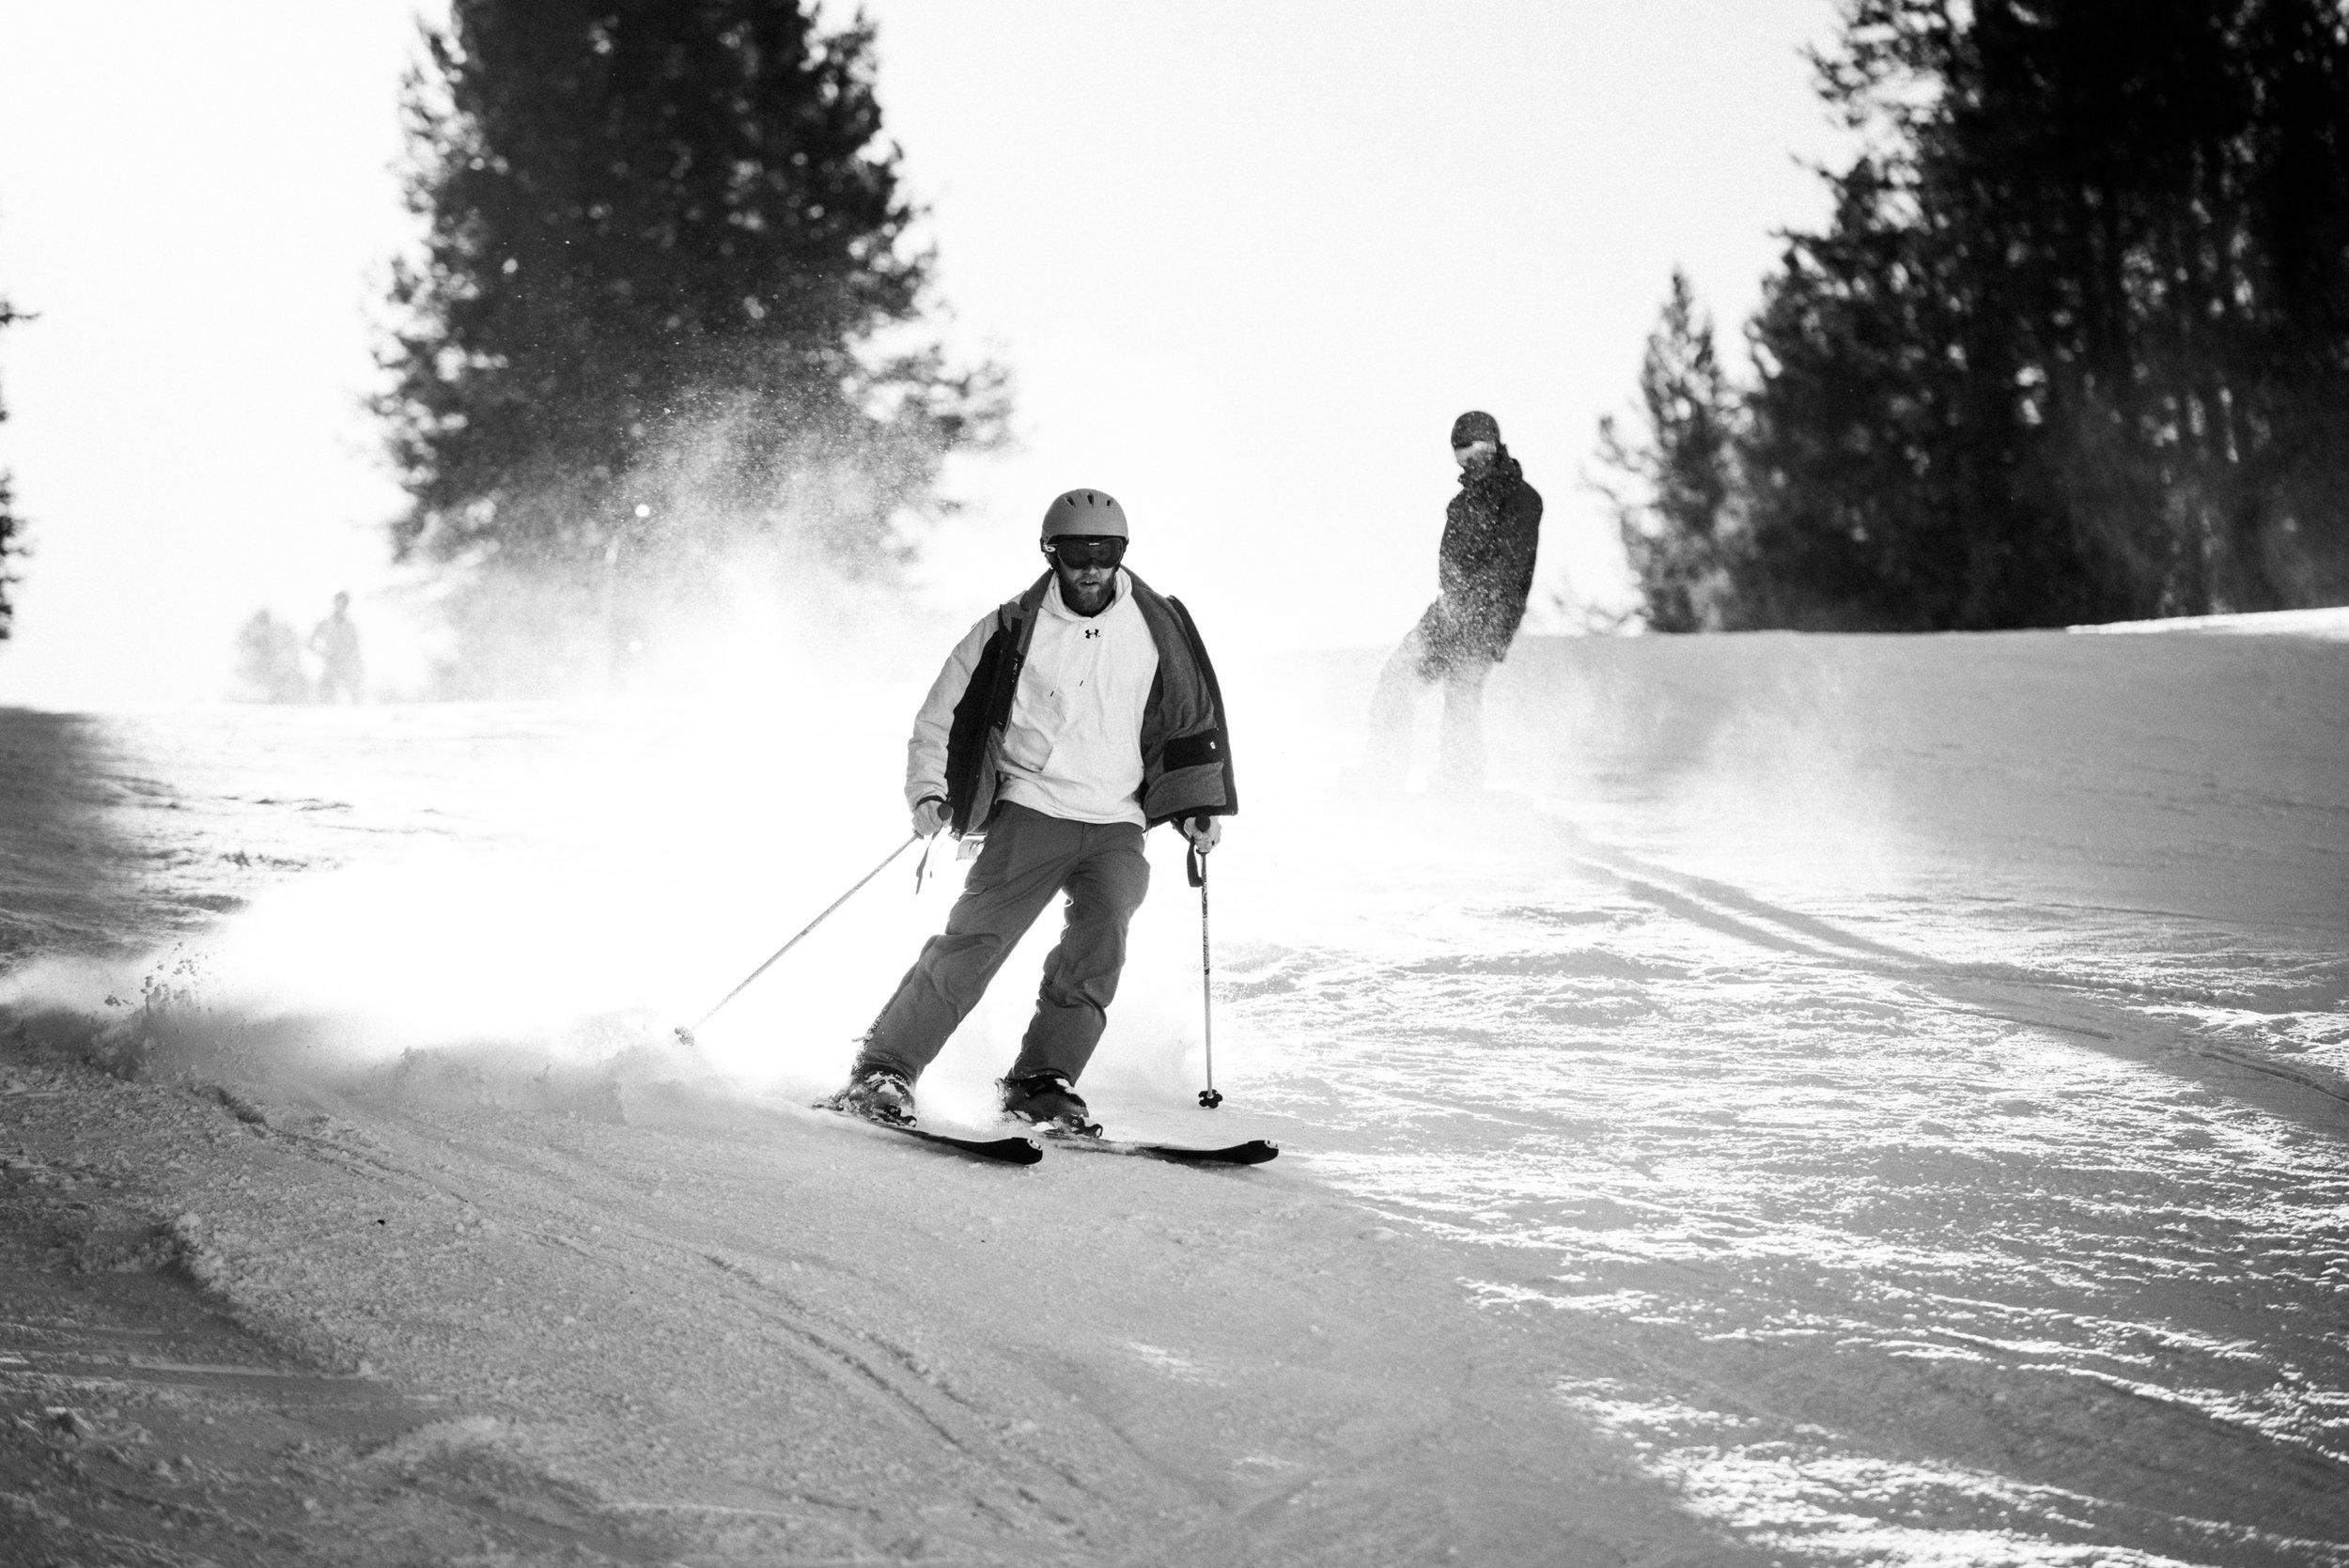 TaraShupe_Outdoor_Photographer_Loweprobags_Colorado_Copper_Mountains_Ski_57.jpg